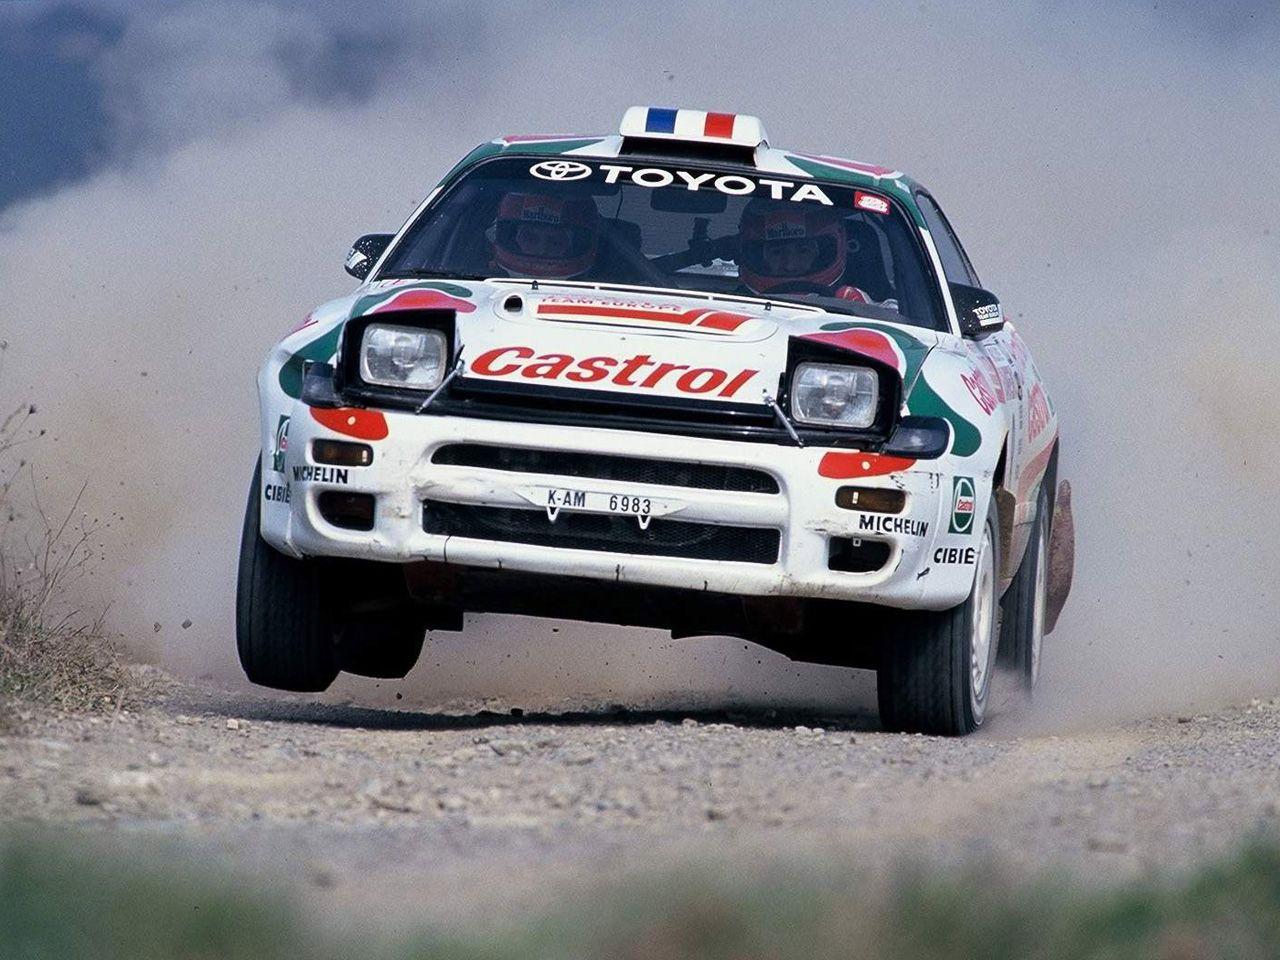 Toyota Celica GT4 rally car | paint jobs | Pinterest | Toyota celica ...